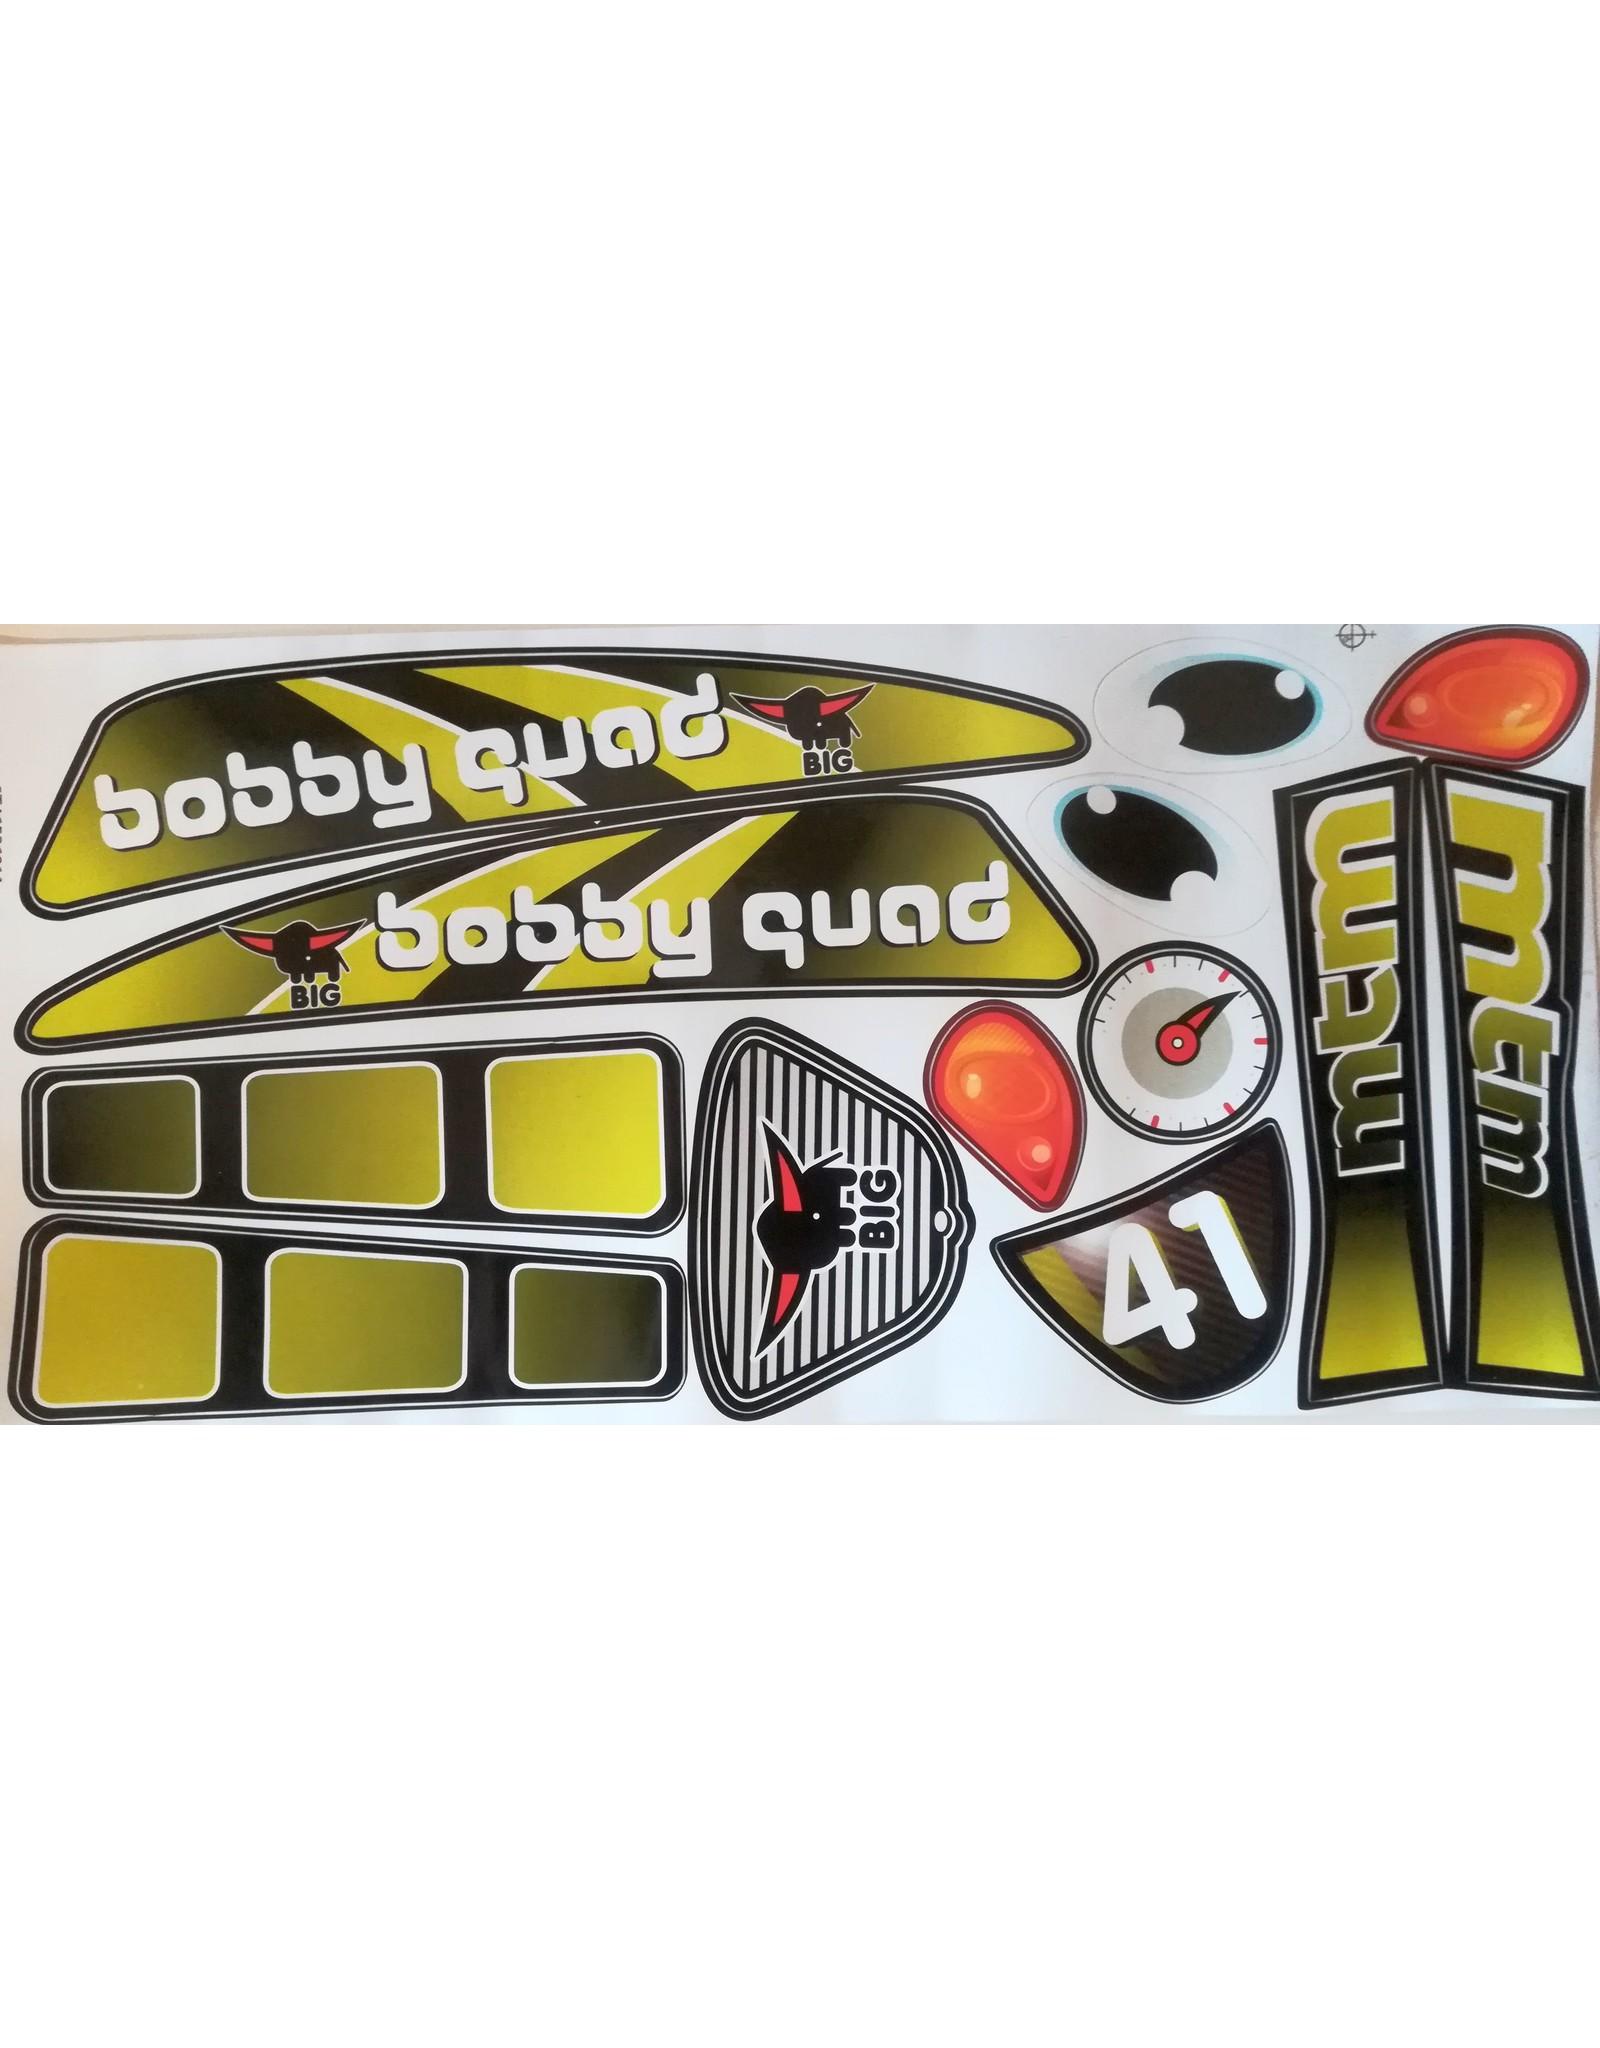 BIG Aufklebersatz BIG Bobby Quad Racing